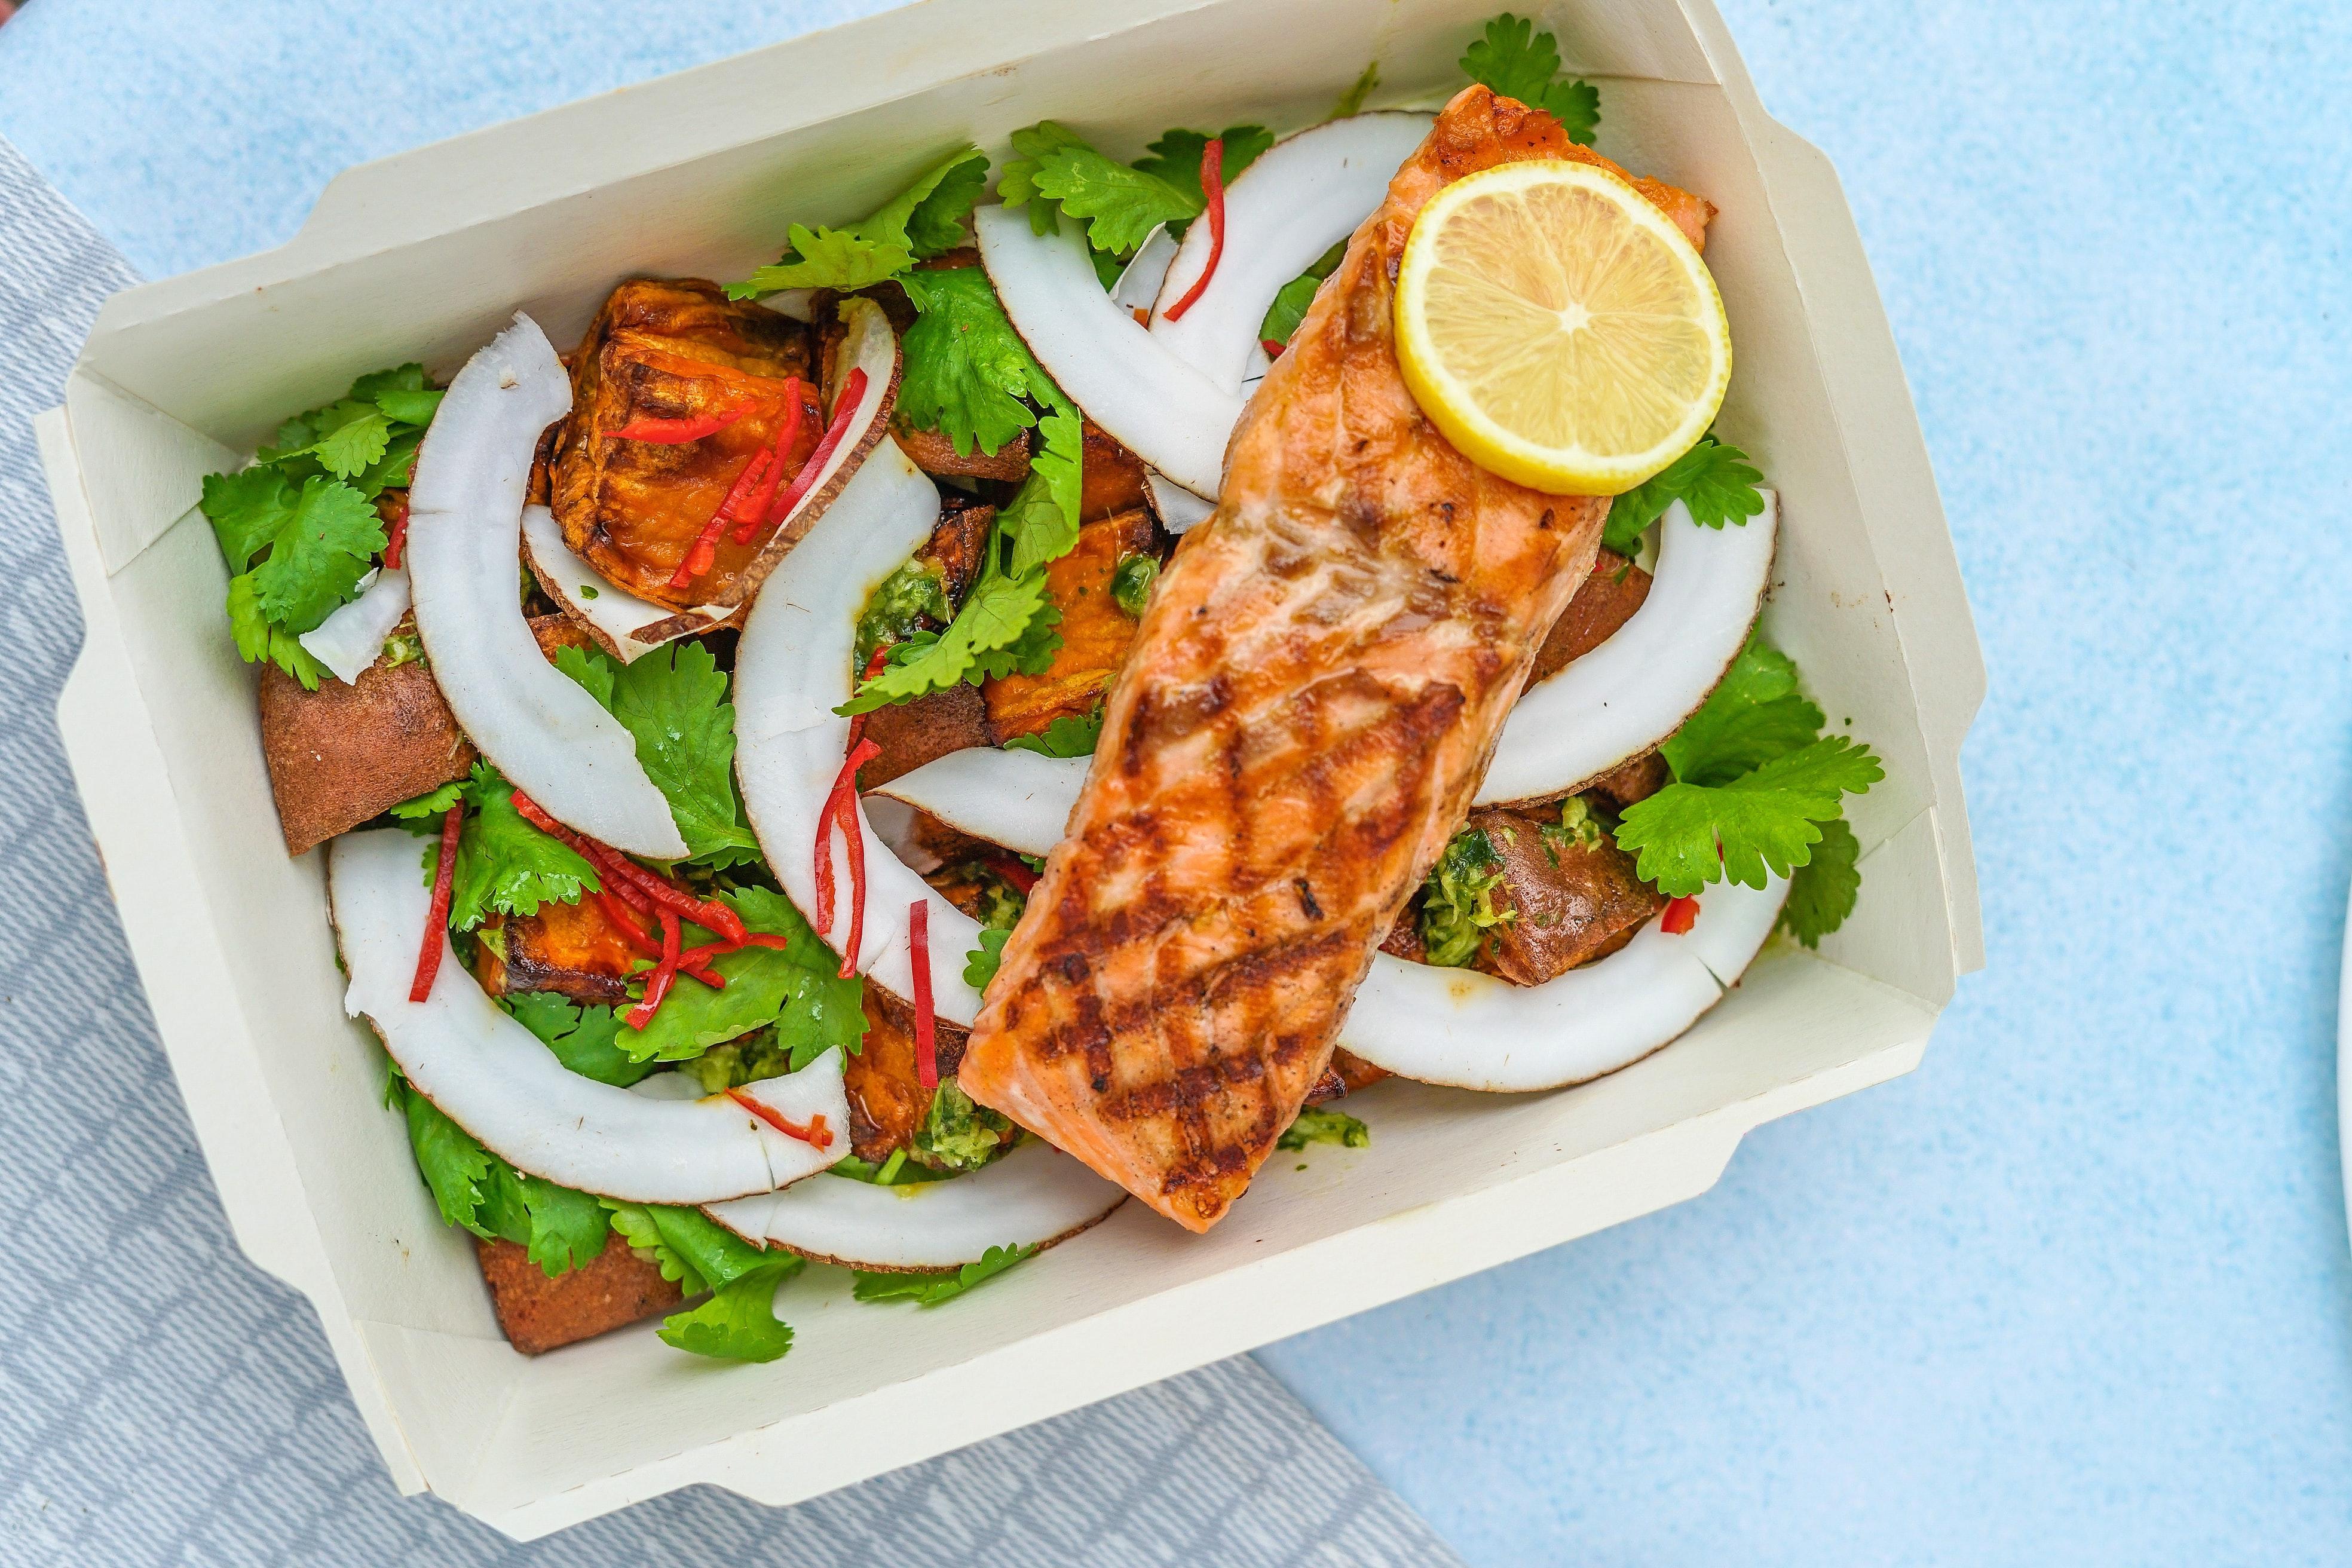 Upscale salmon dinner